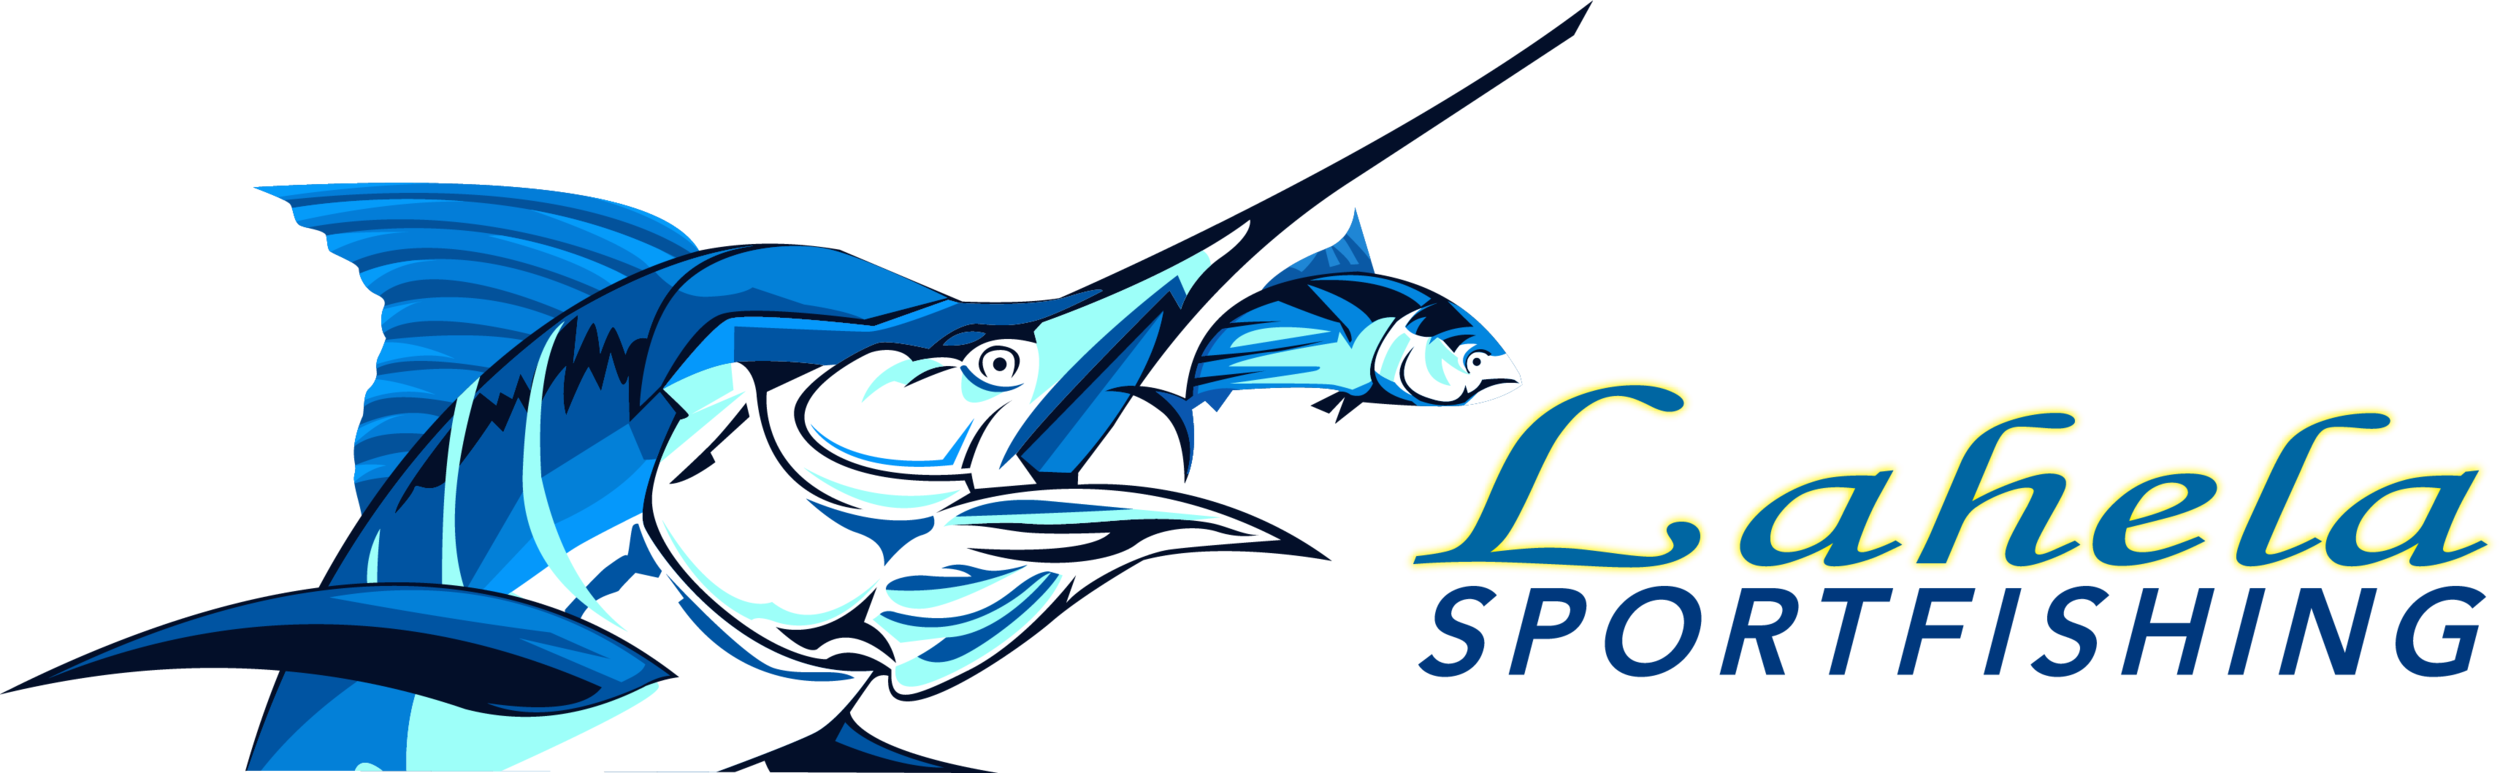 https://www.sportfishkauai.com/